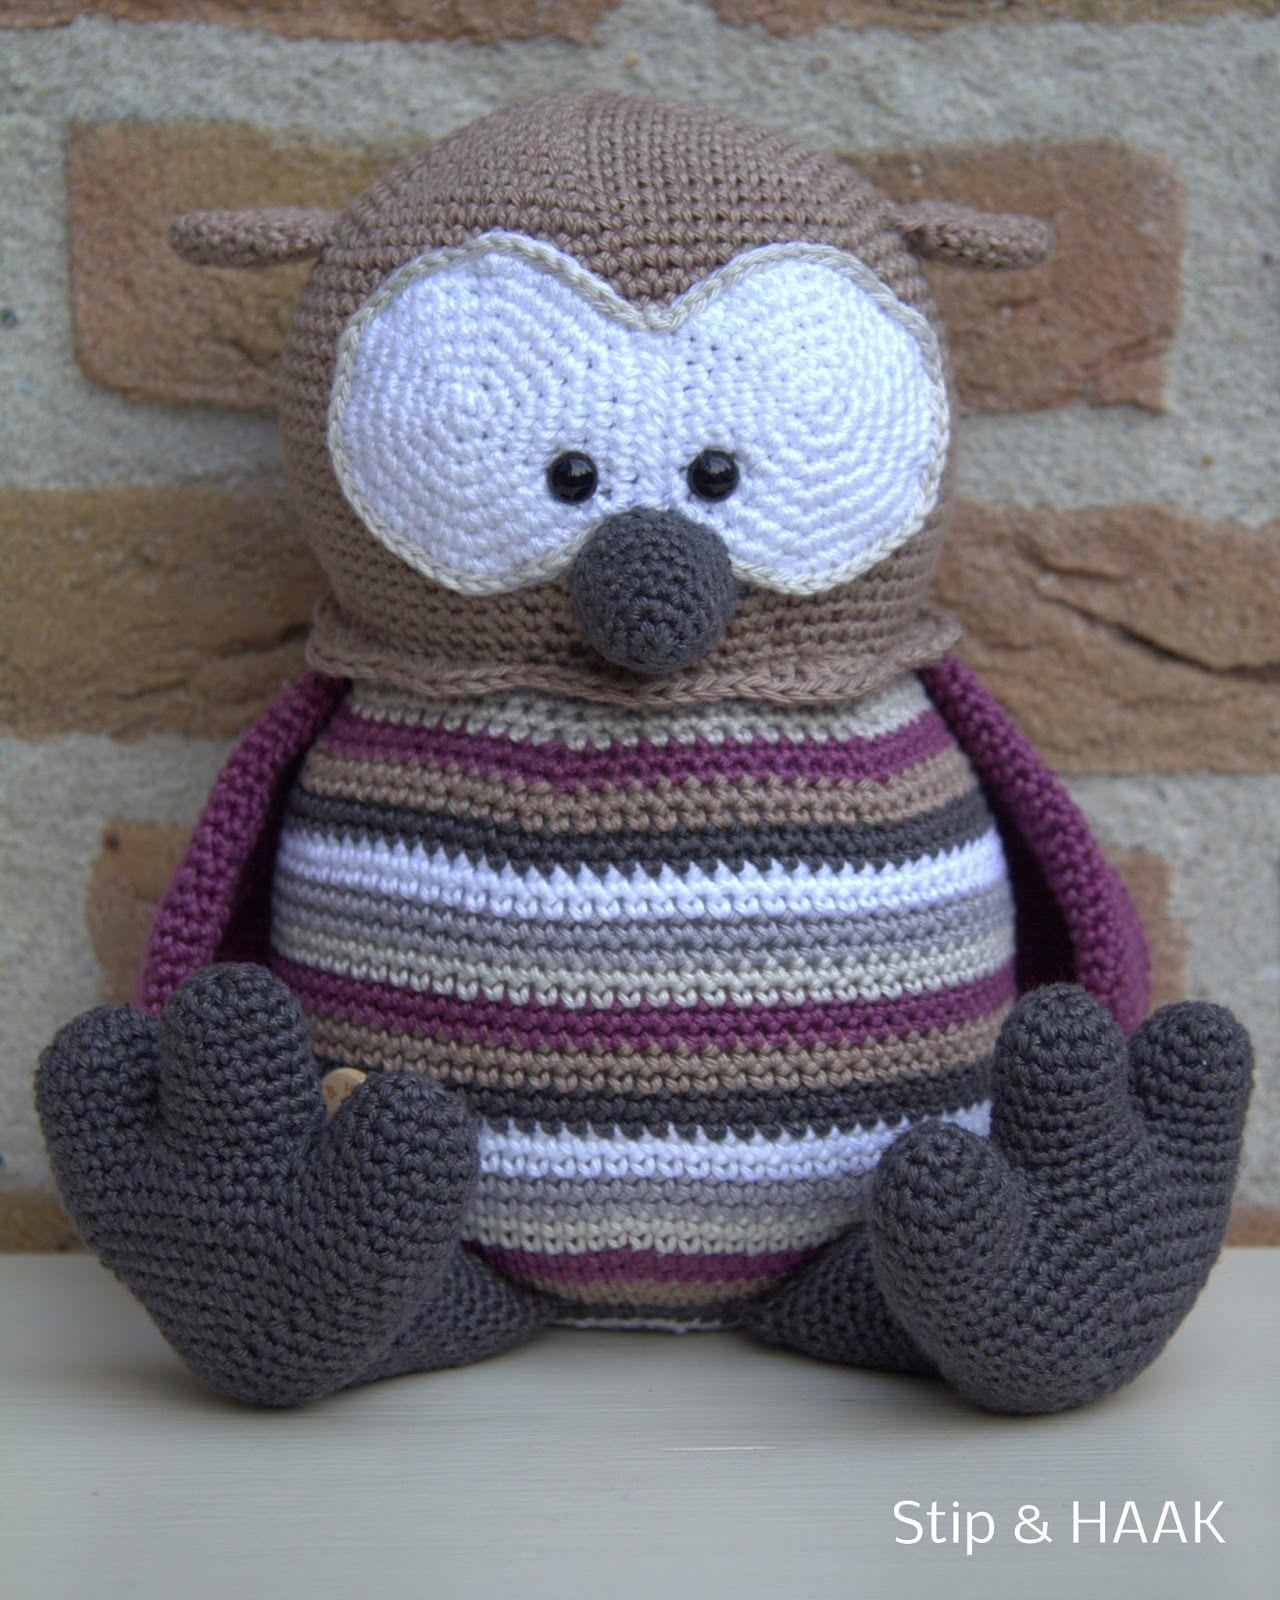 Uil Floortje Stip Haak Crochet Crochet Owls Crochet